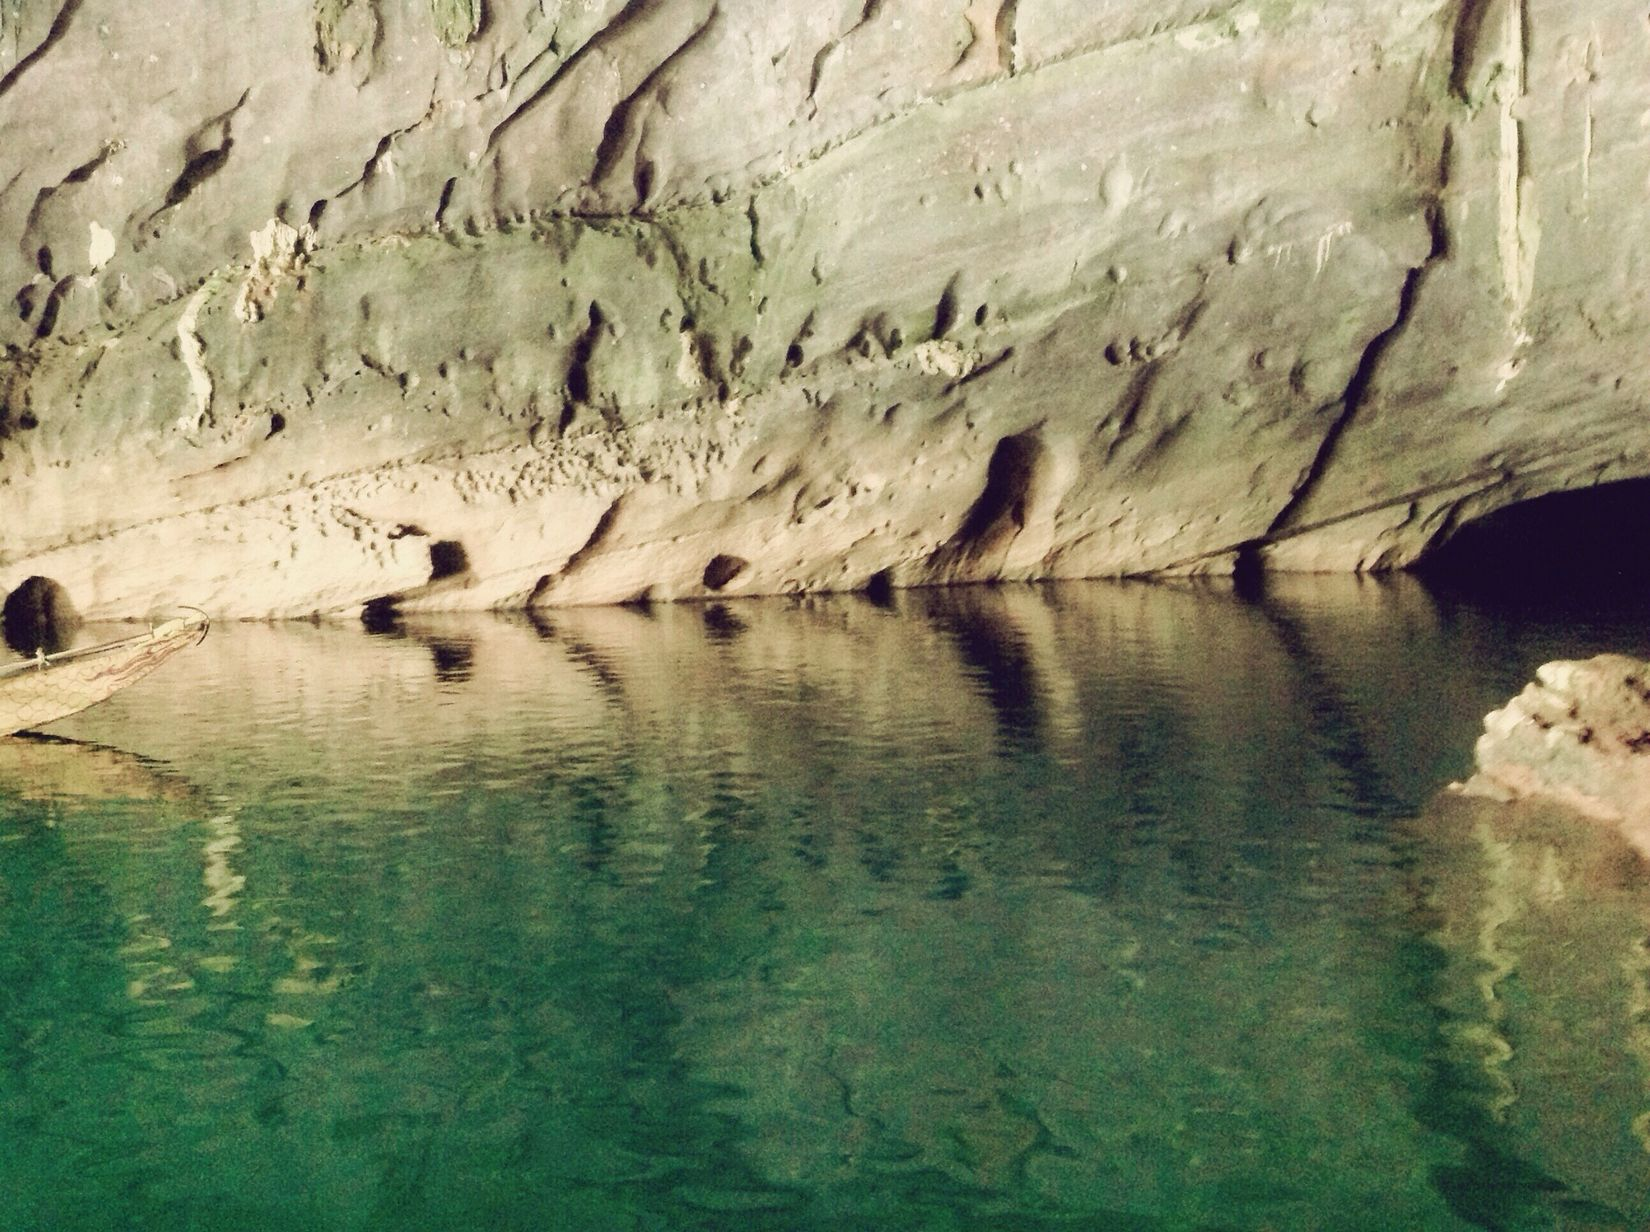 REFLECTION Silence Cave Landscape Beauty In Nature Deep Reflection Curve Water Water Reflections Vietnam